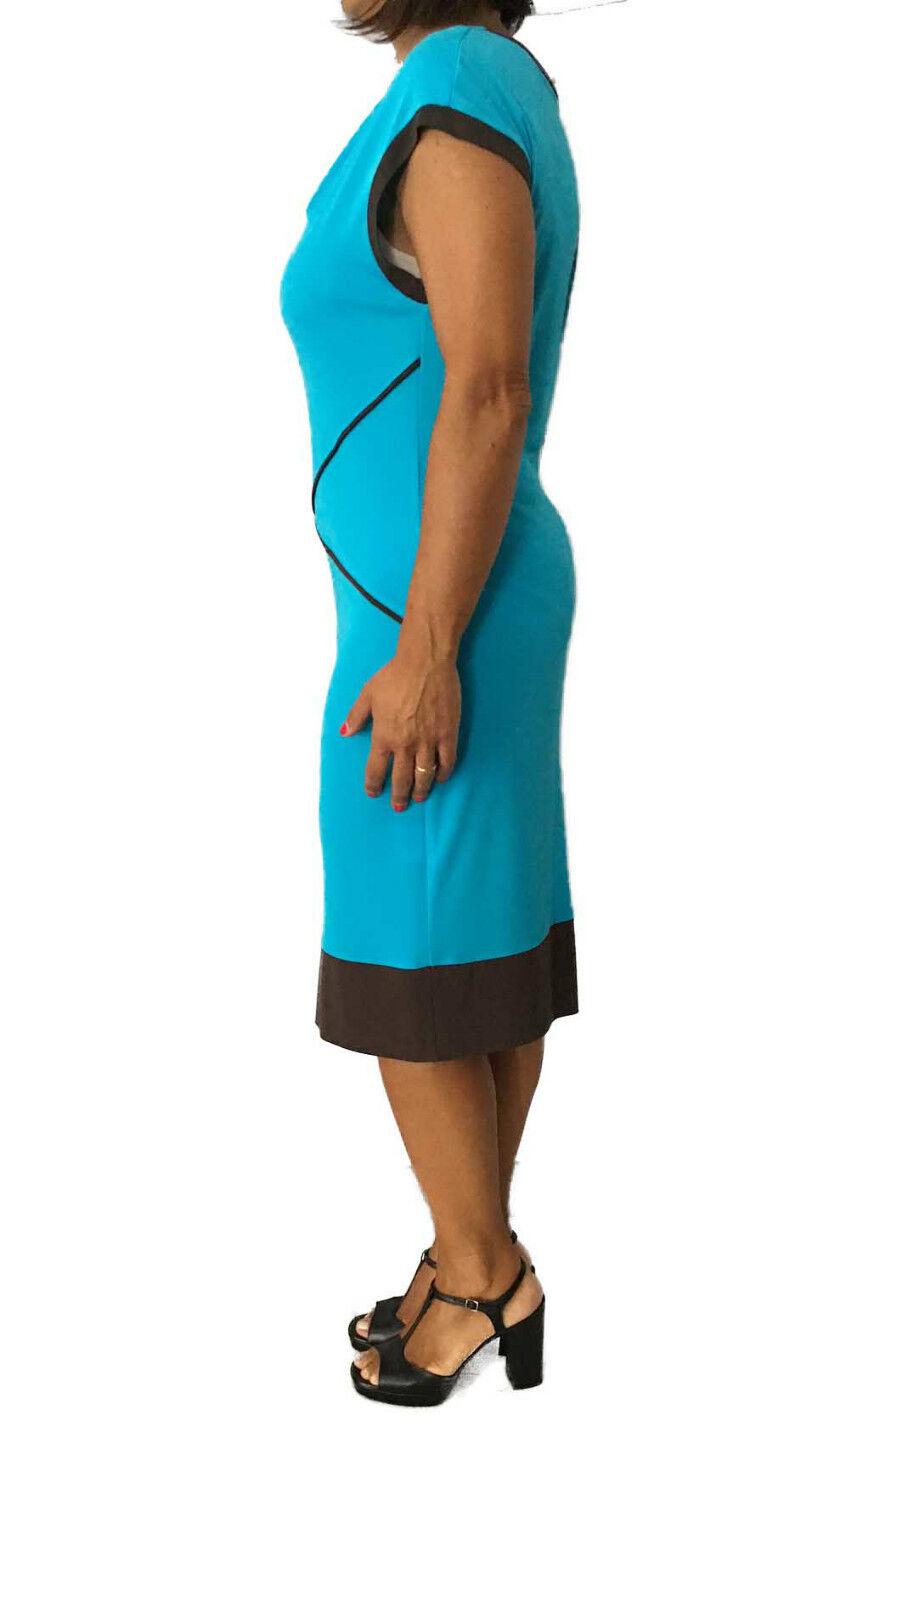 CALALUNA women's dress turquoise with profiles dark dark dark brown 72% viscose f2788b